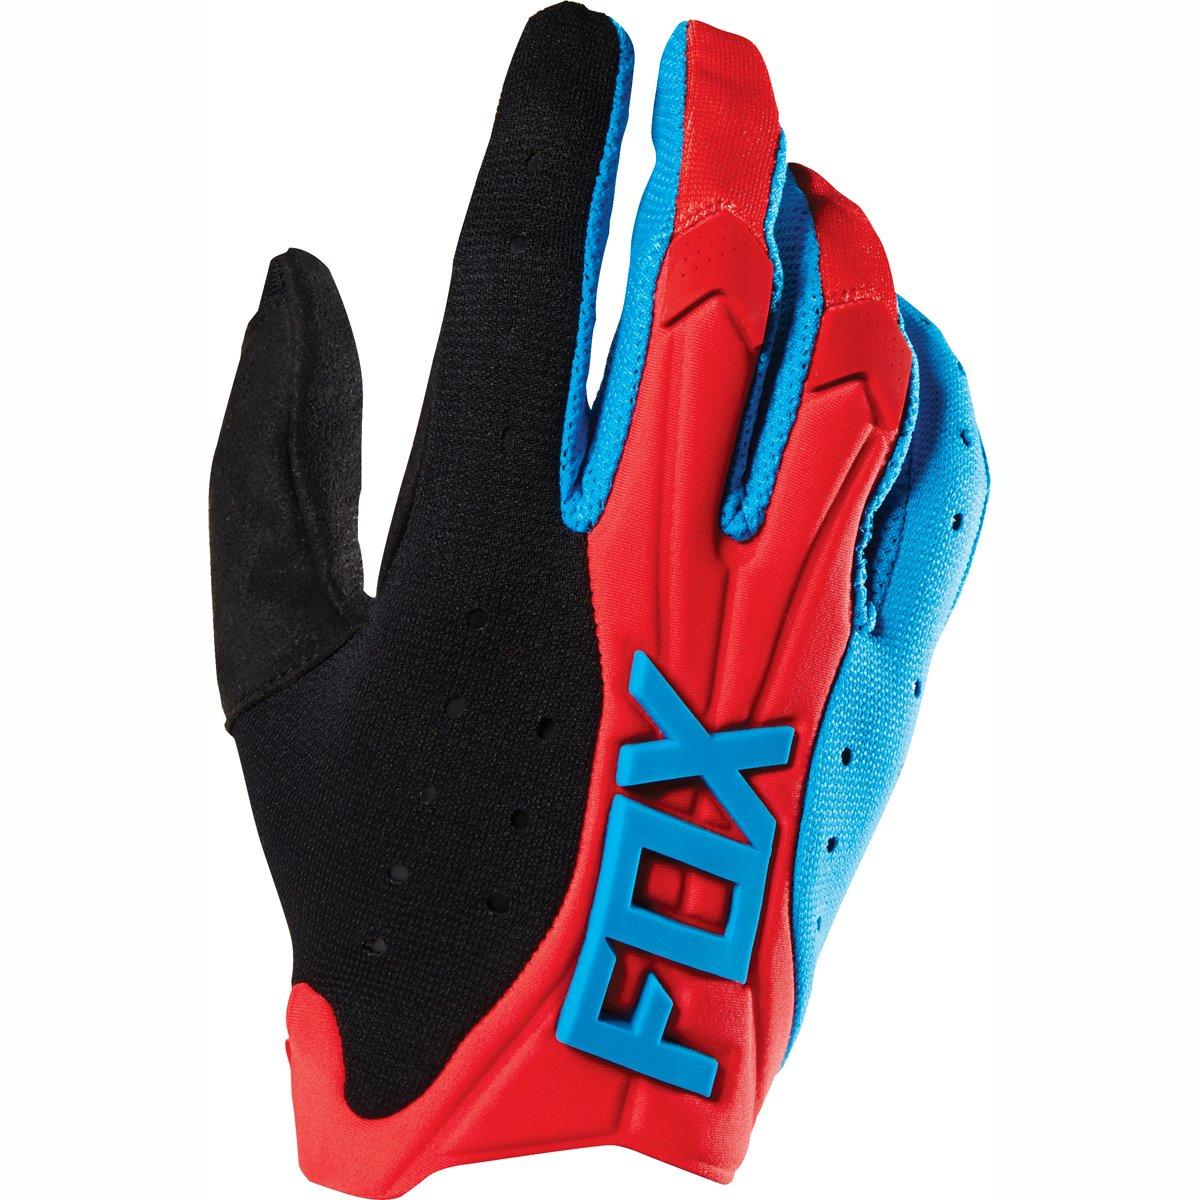 guante fox flexair azul/rojo talle s